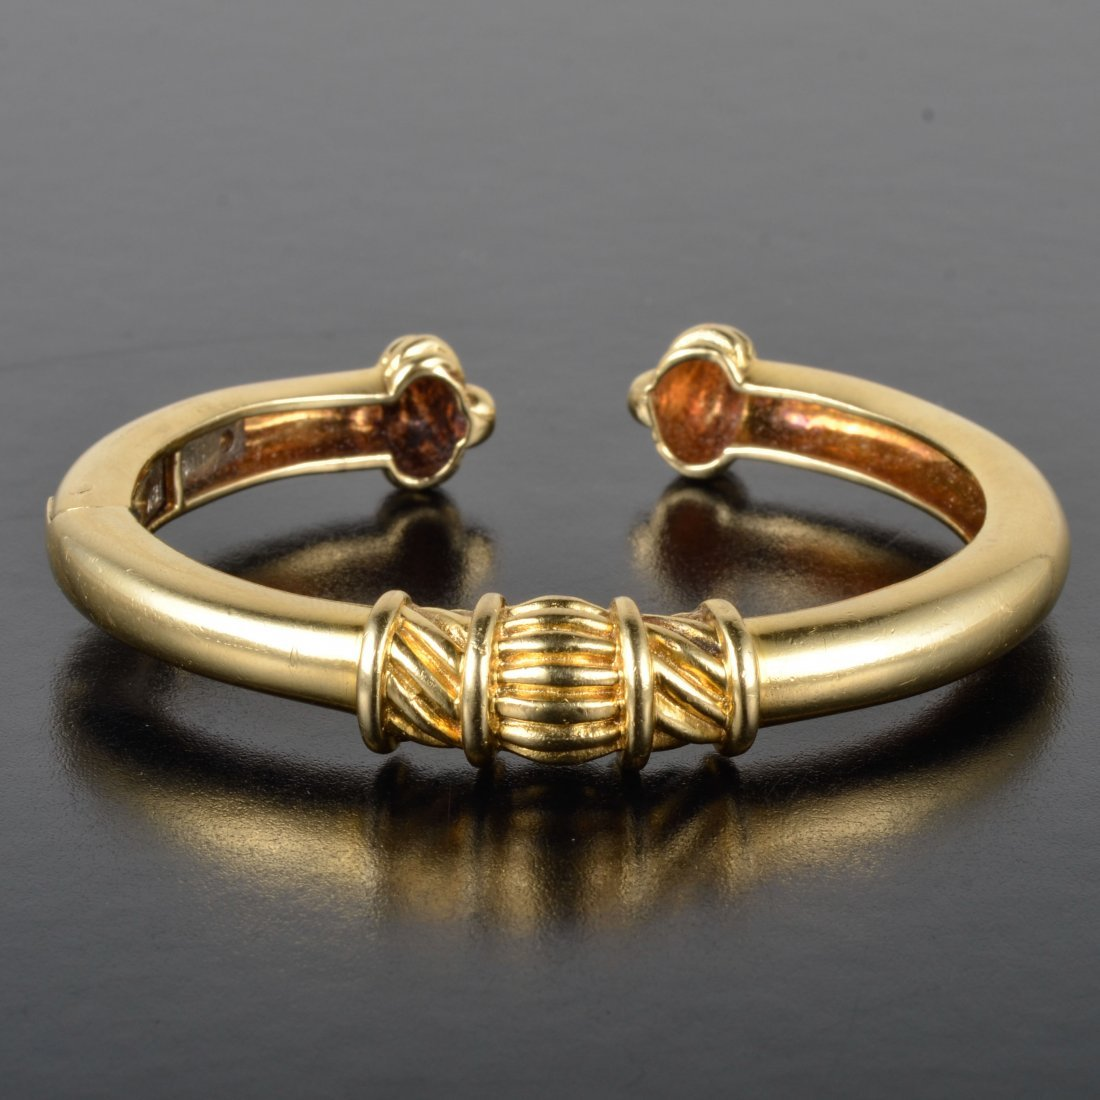 Tiffany gold bangle